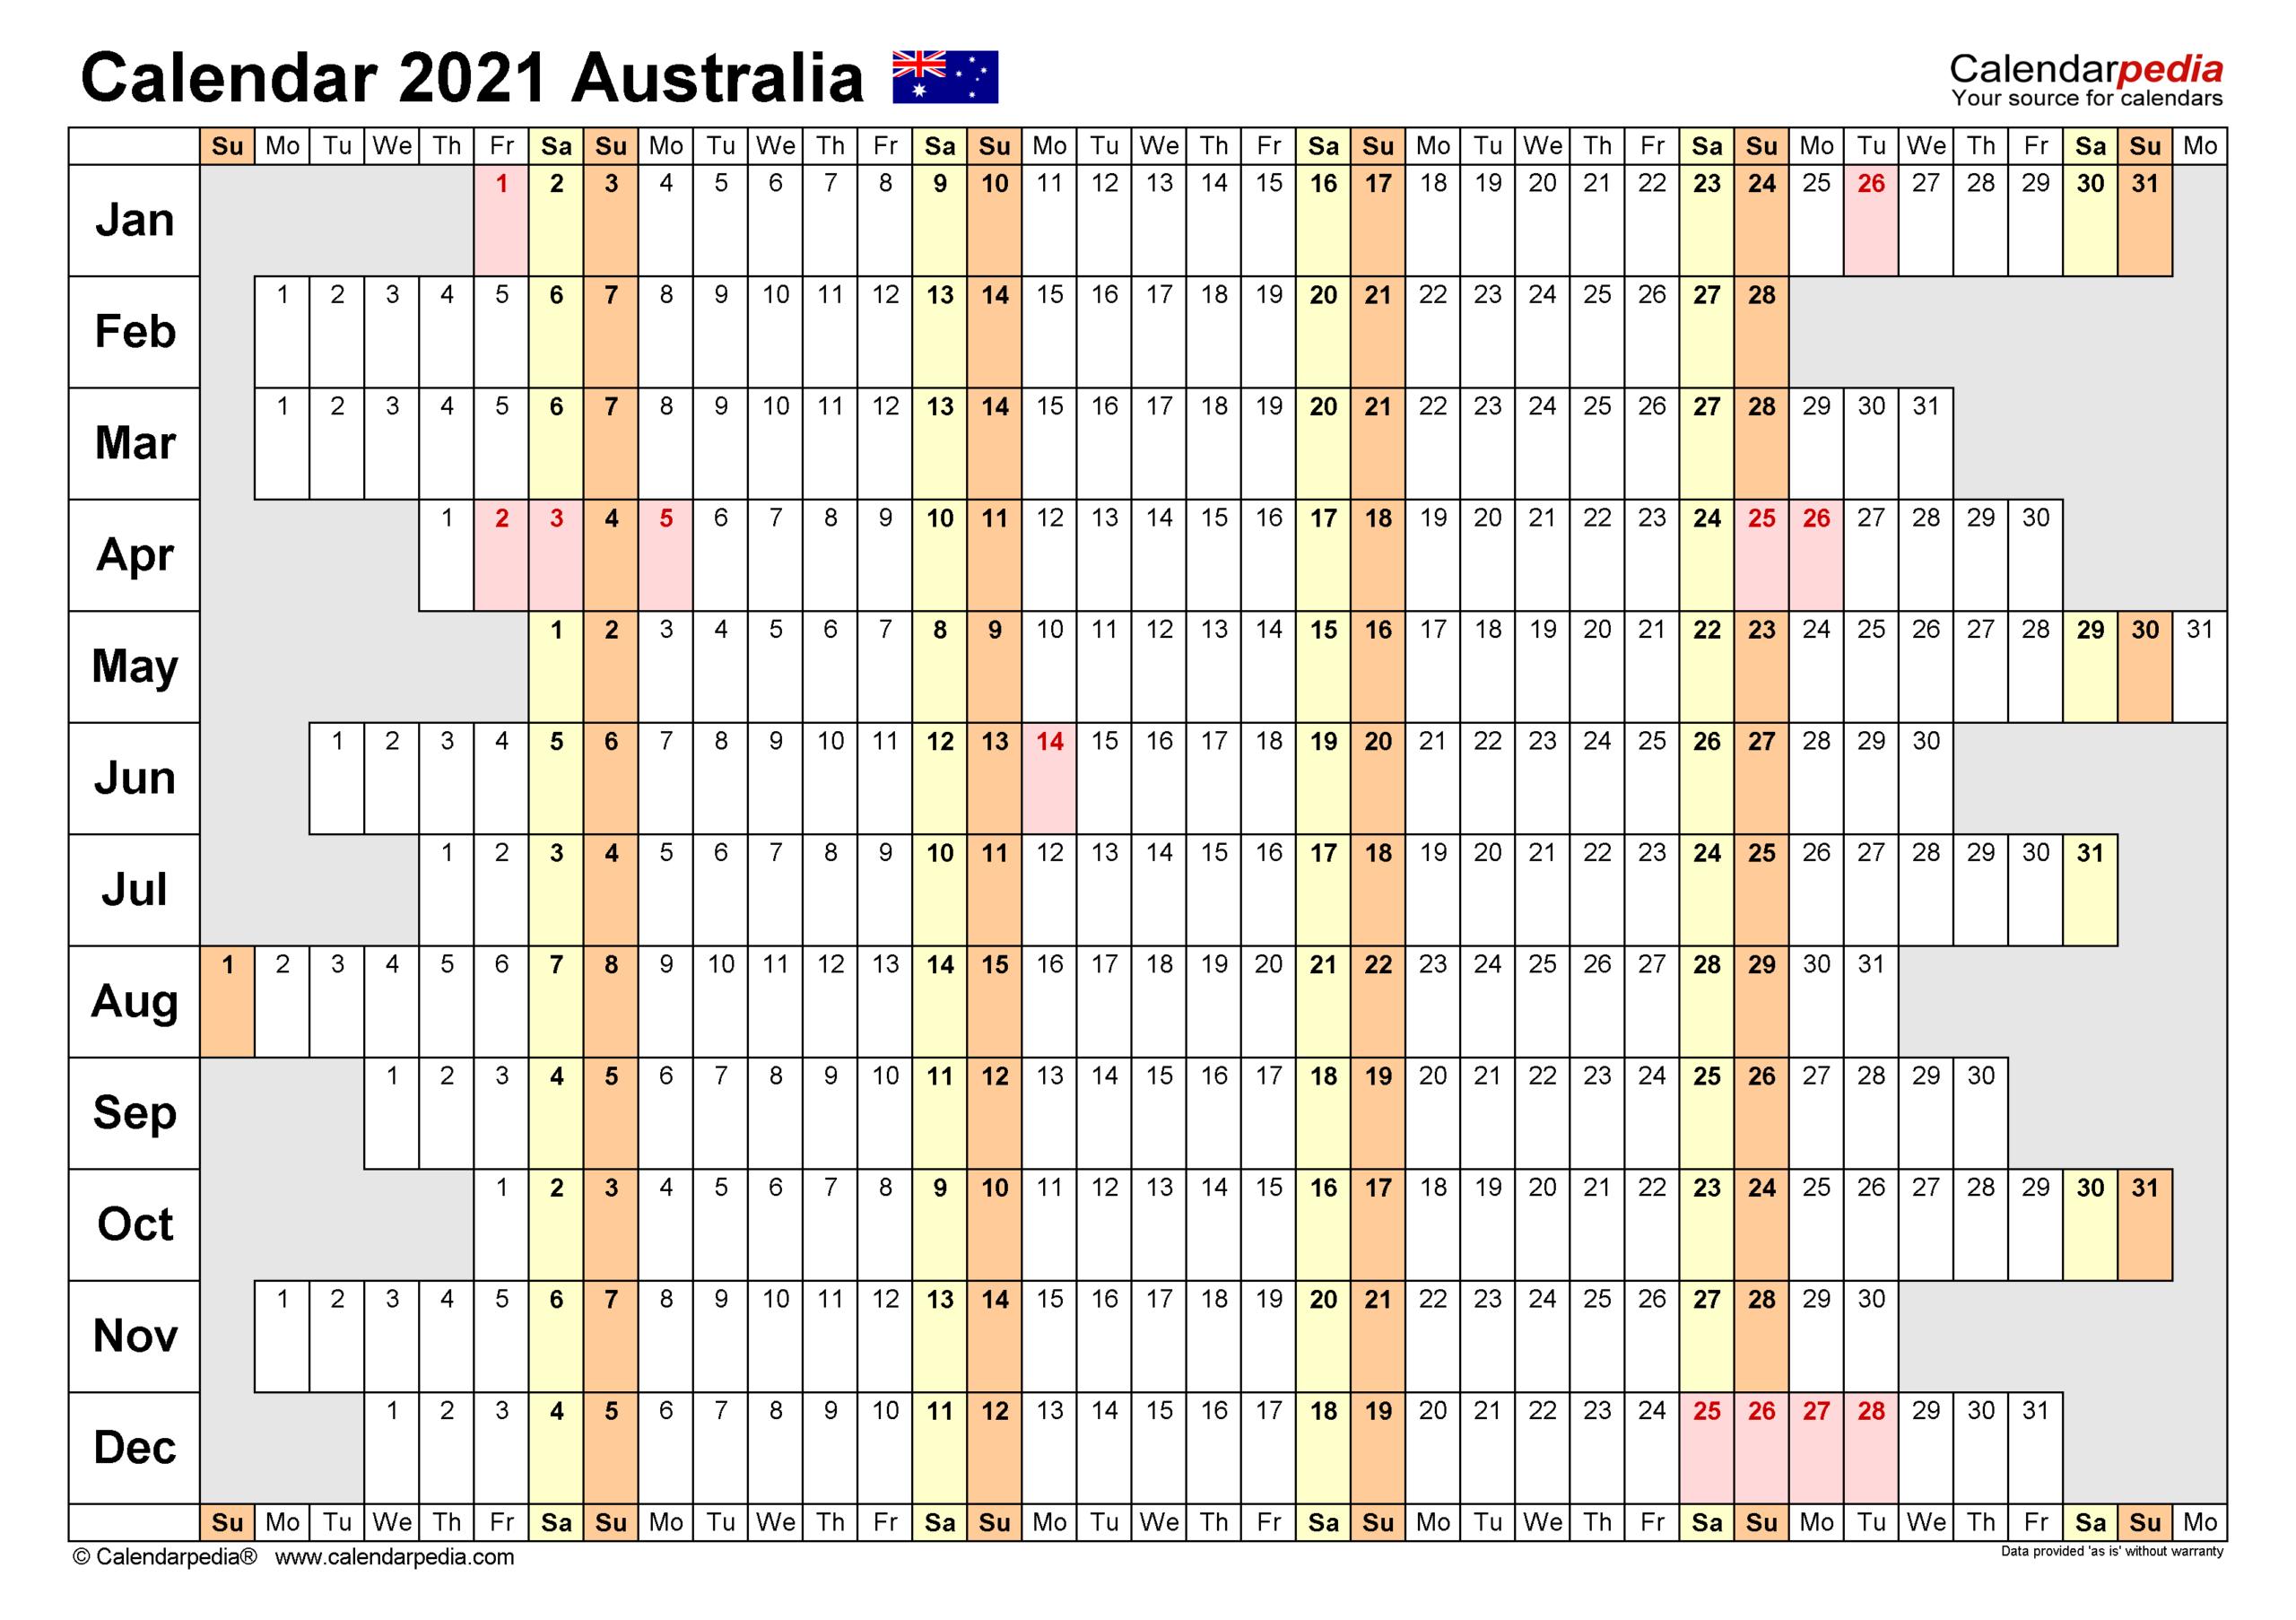 Australia Calendar 2021 - Free Printable Word Templates